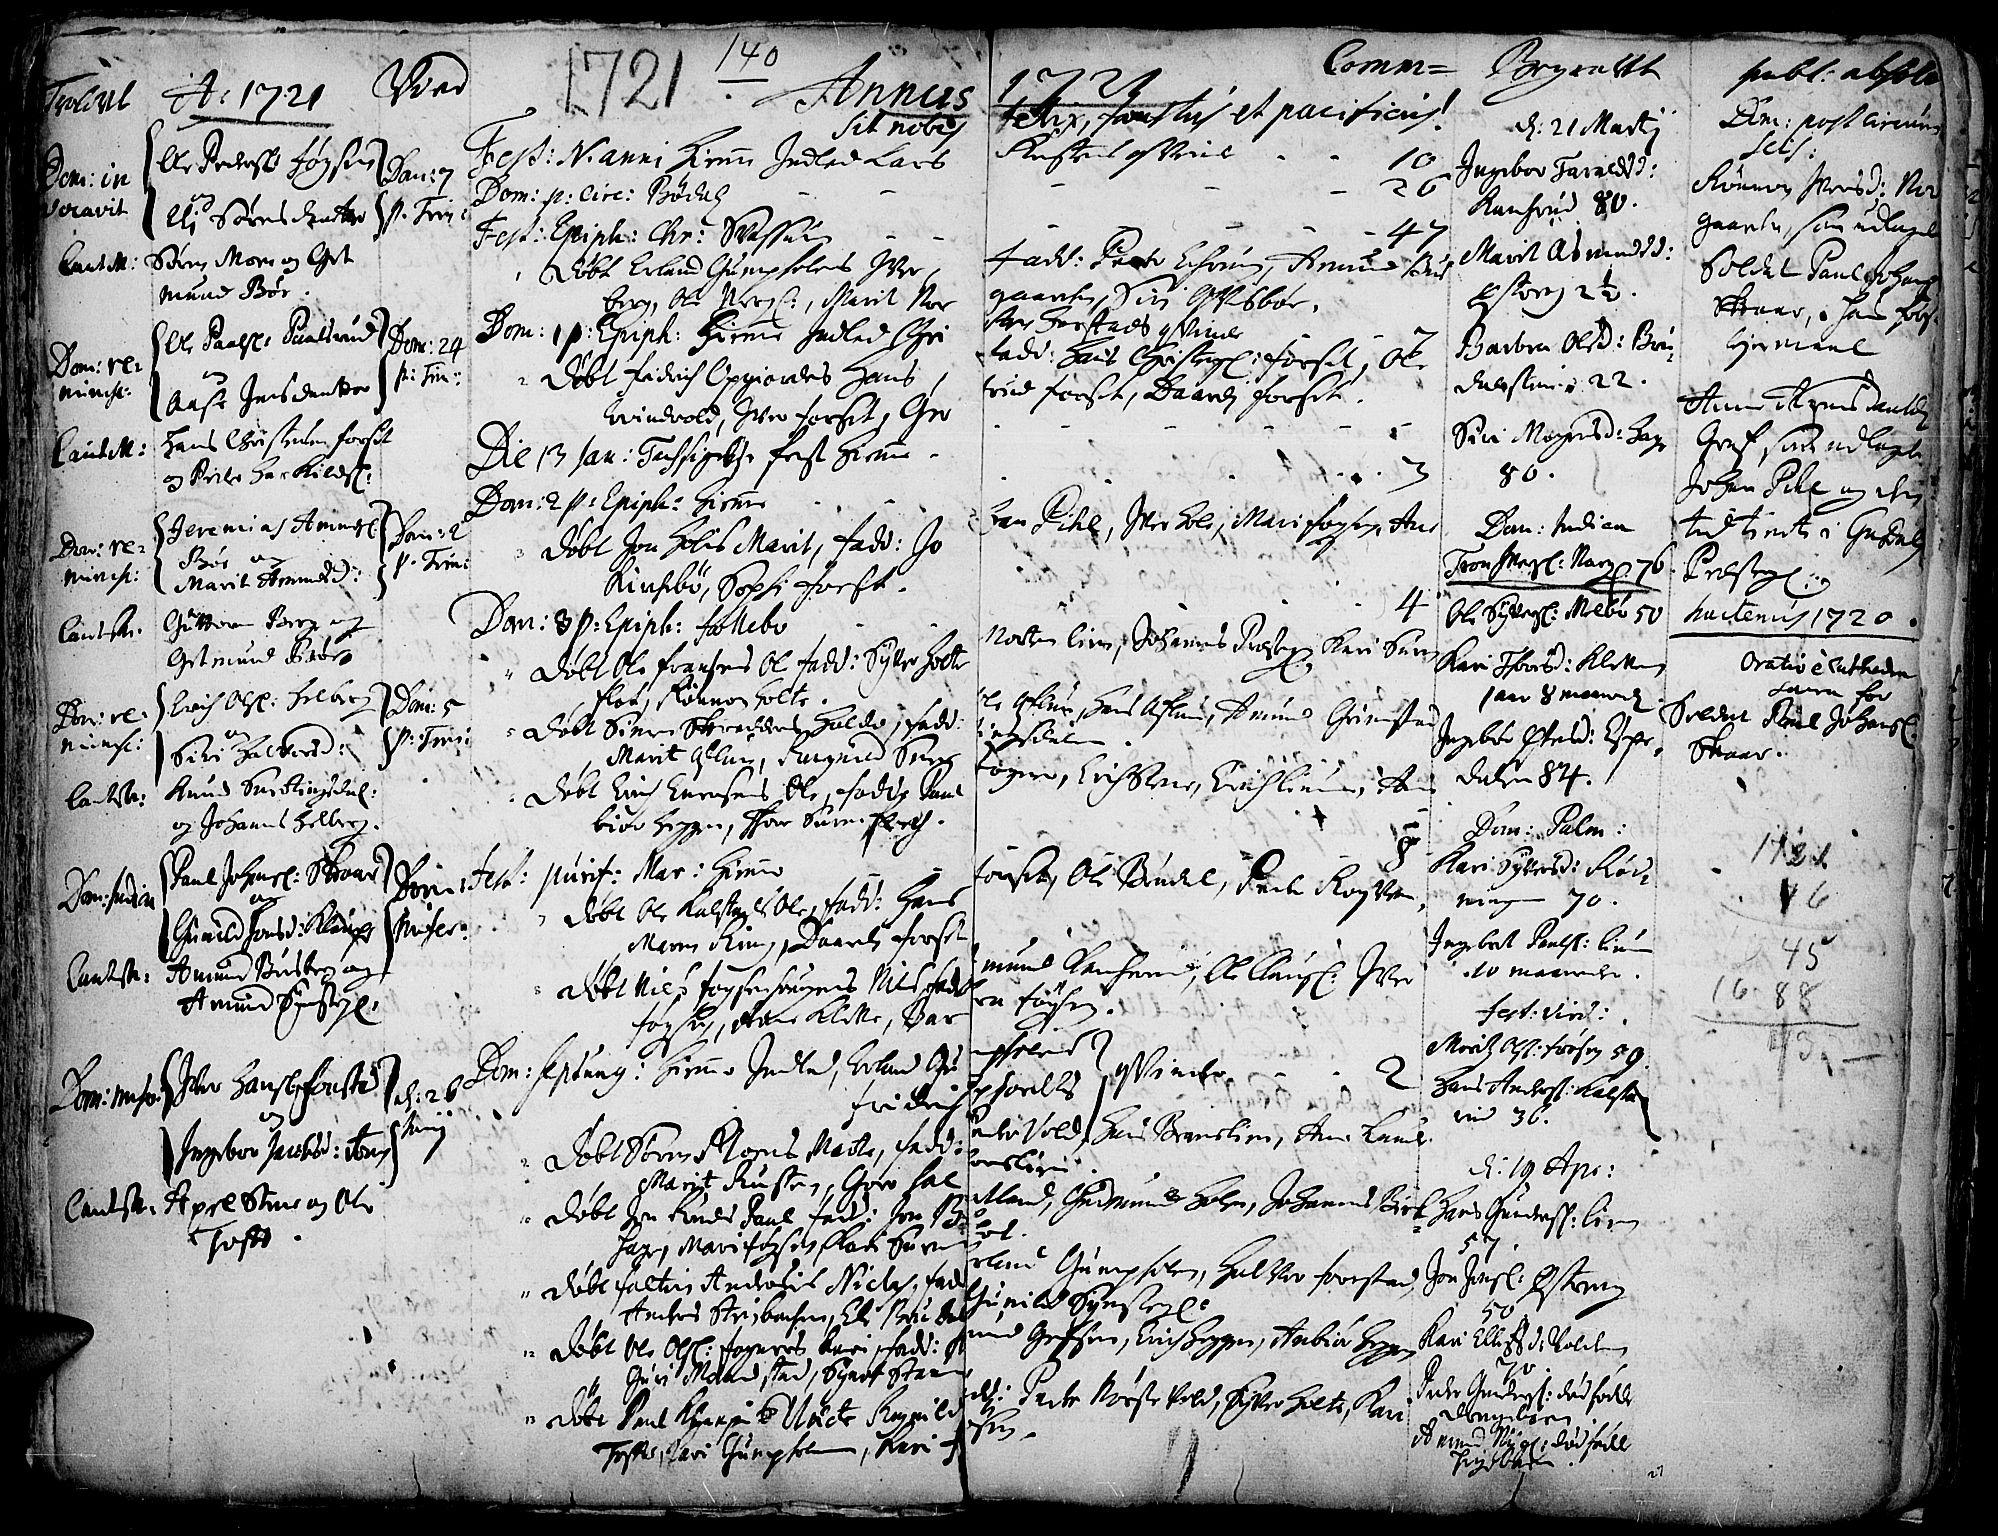 SAH, Gausdal prestekontor, Ministerialbok nr. 1, 1693-1728, s. 140